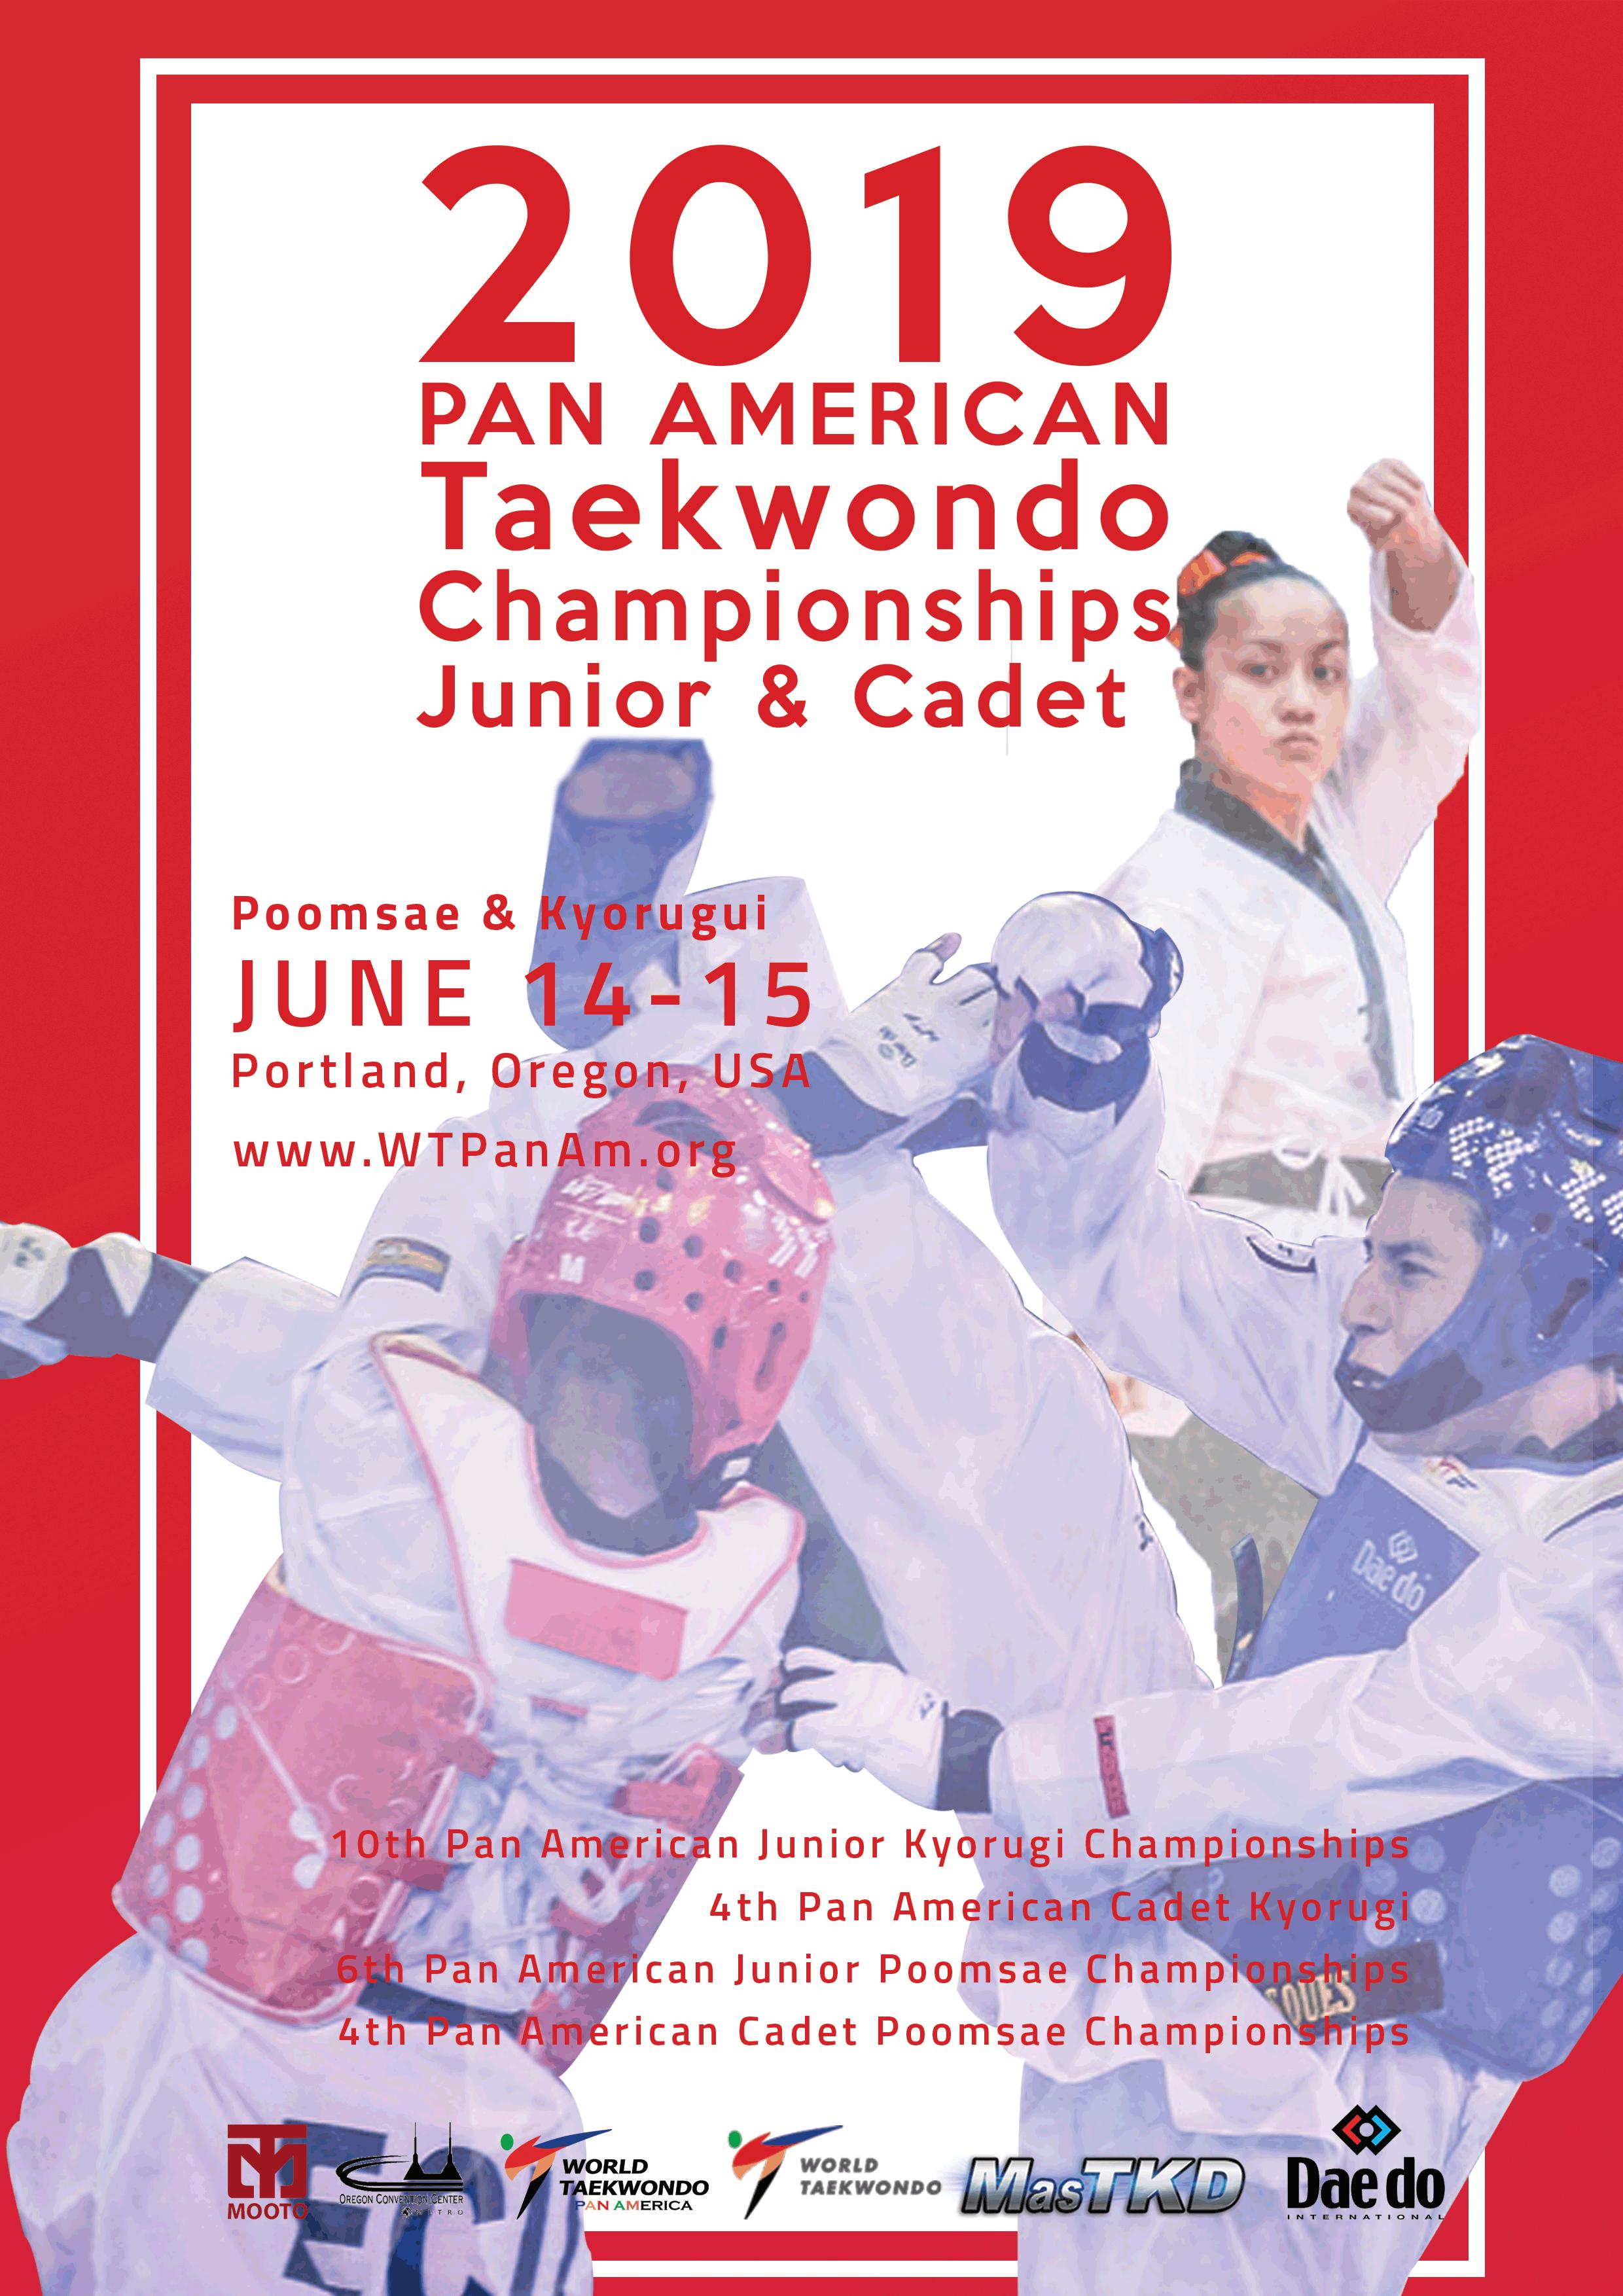 CADETE-Y-JUNIOR-PANAMERICANO Portland 2019 Taekwondo